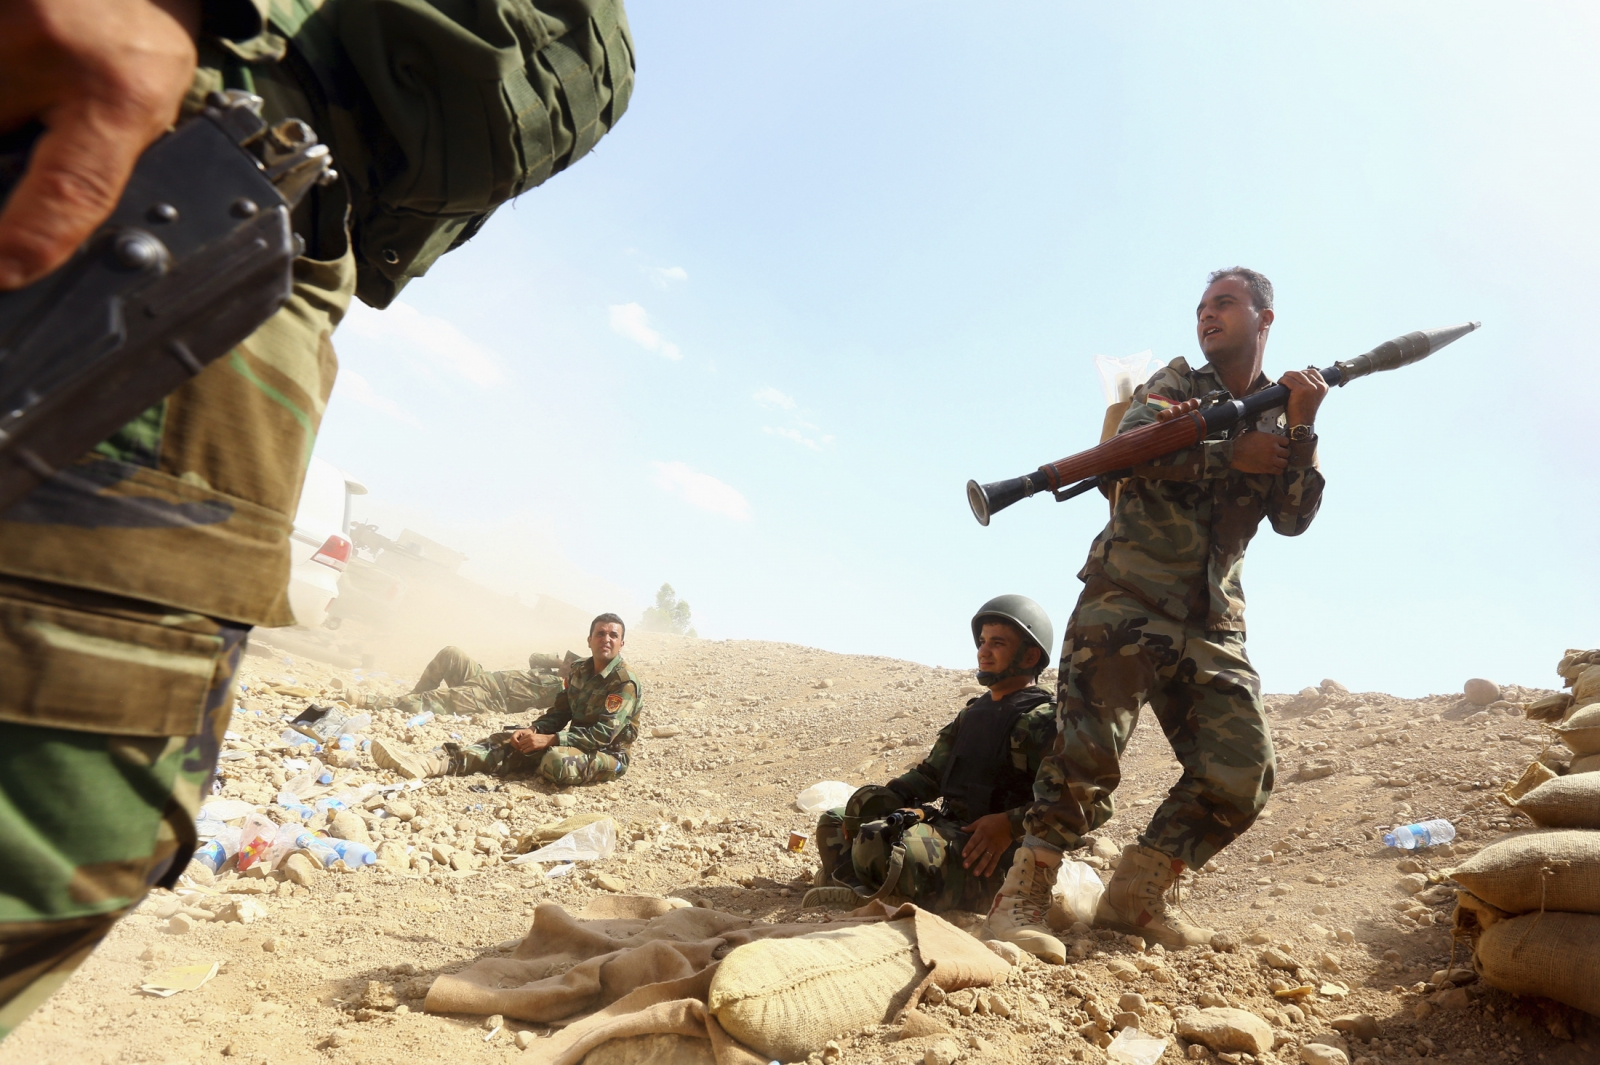 "Kurdish ""peshmerga"" troops take part in an intensive security deployment against Islamic State militants"